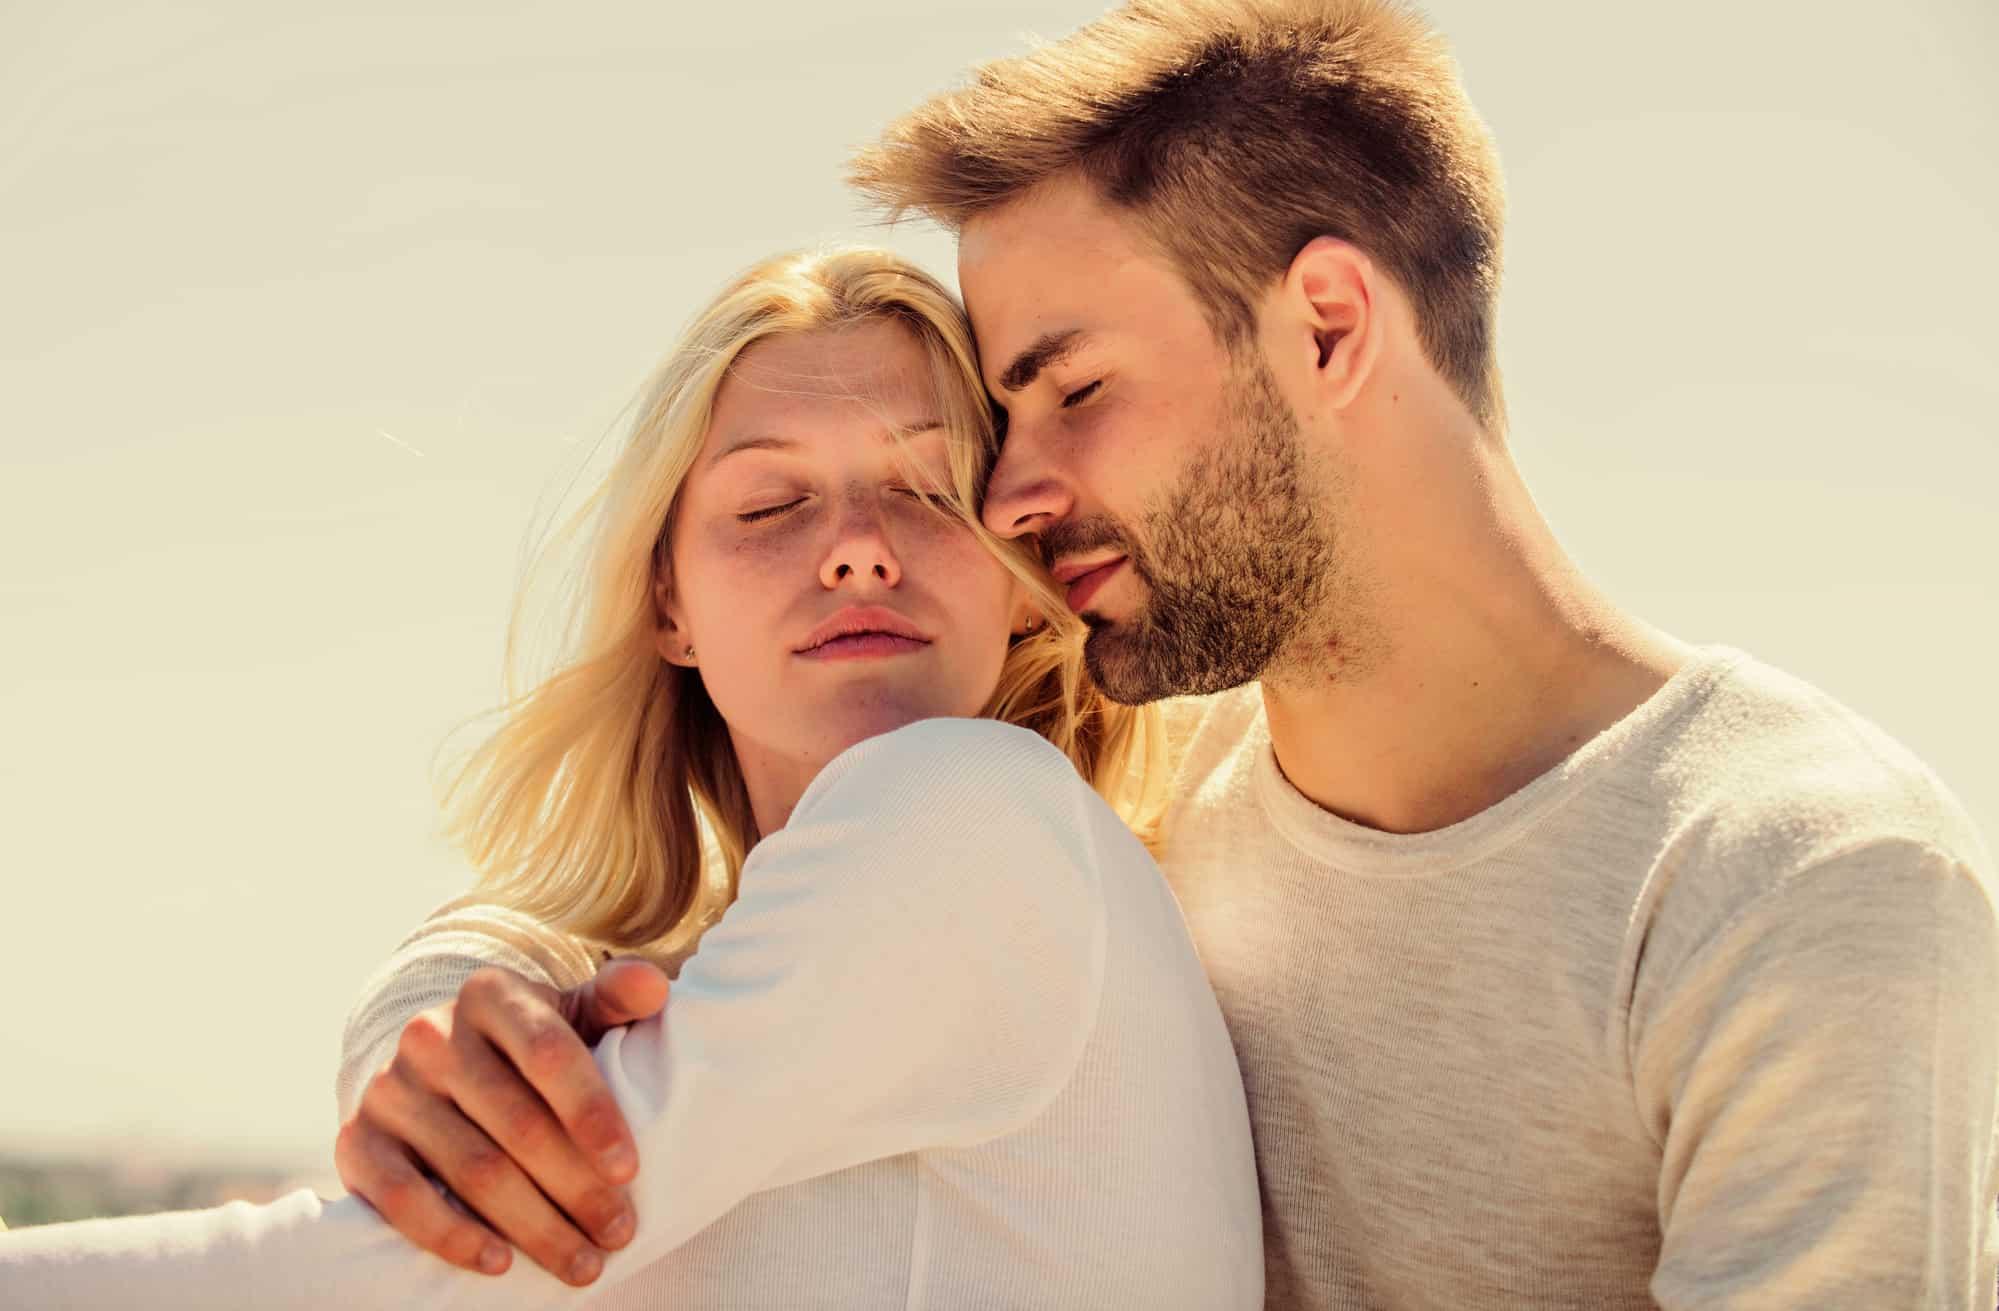 Man sexually woman virgo libra Libra Sexuality: